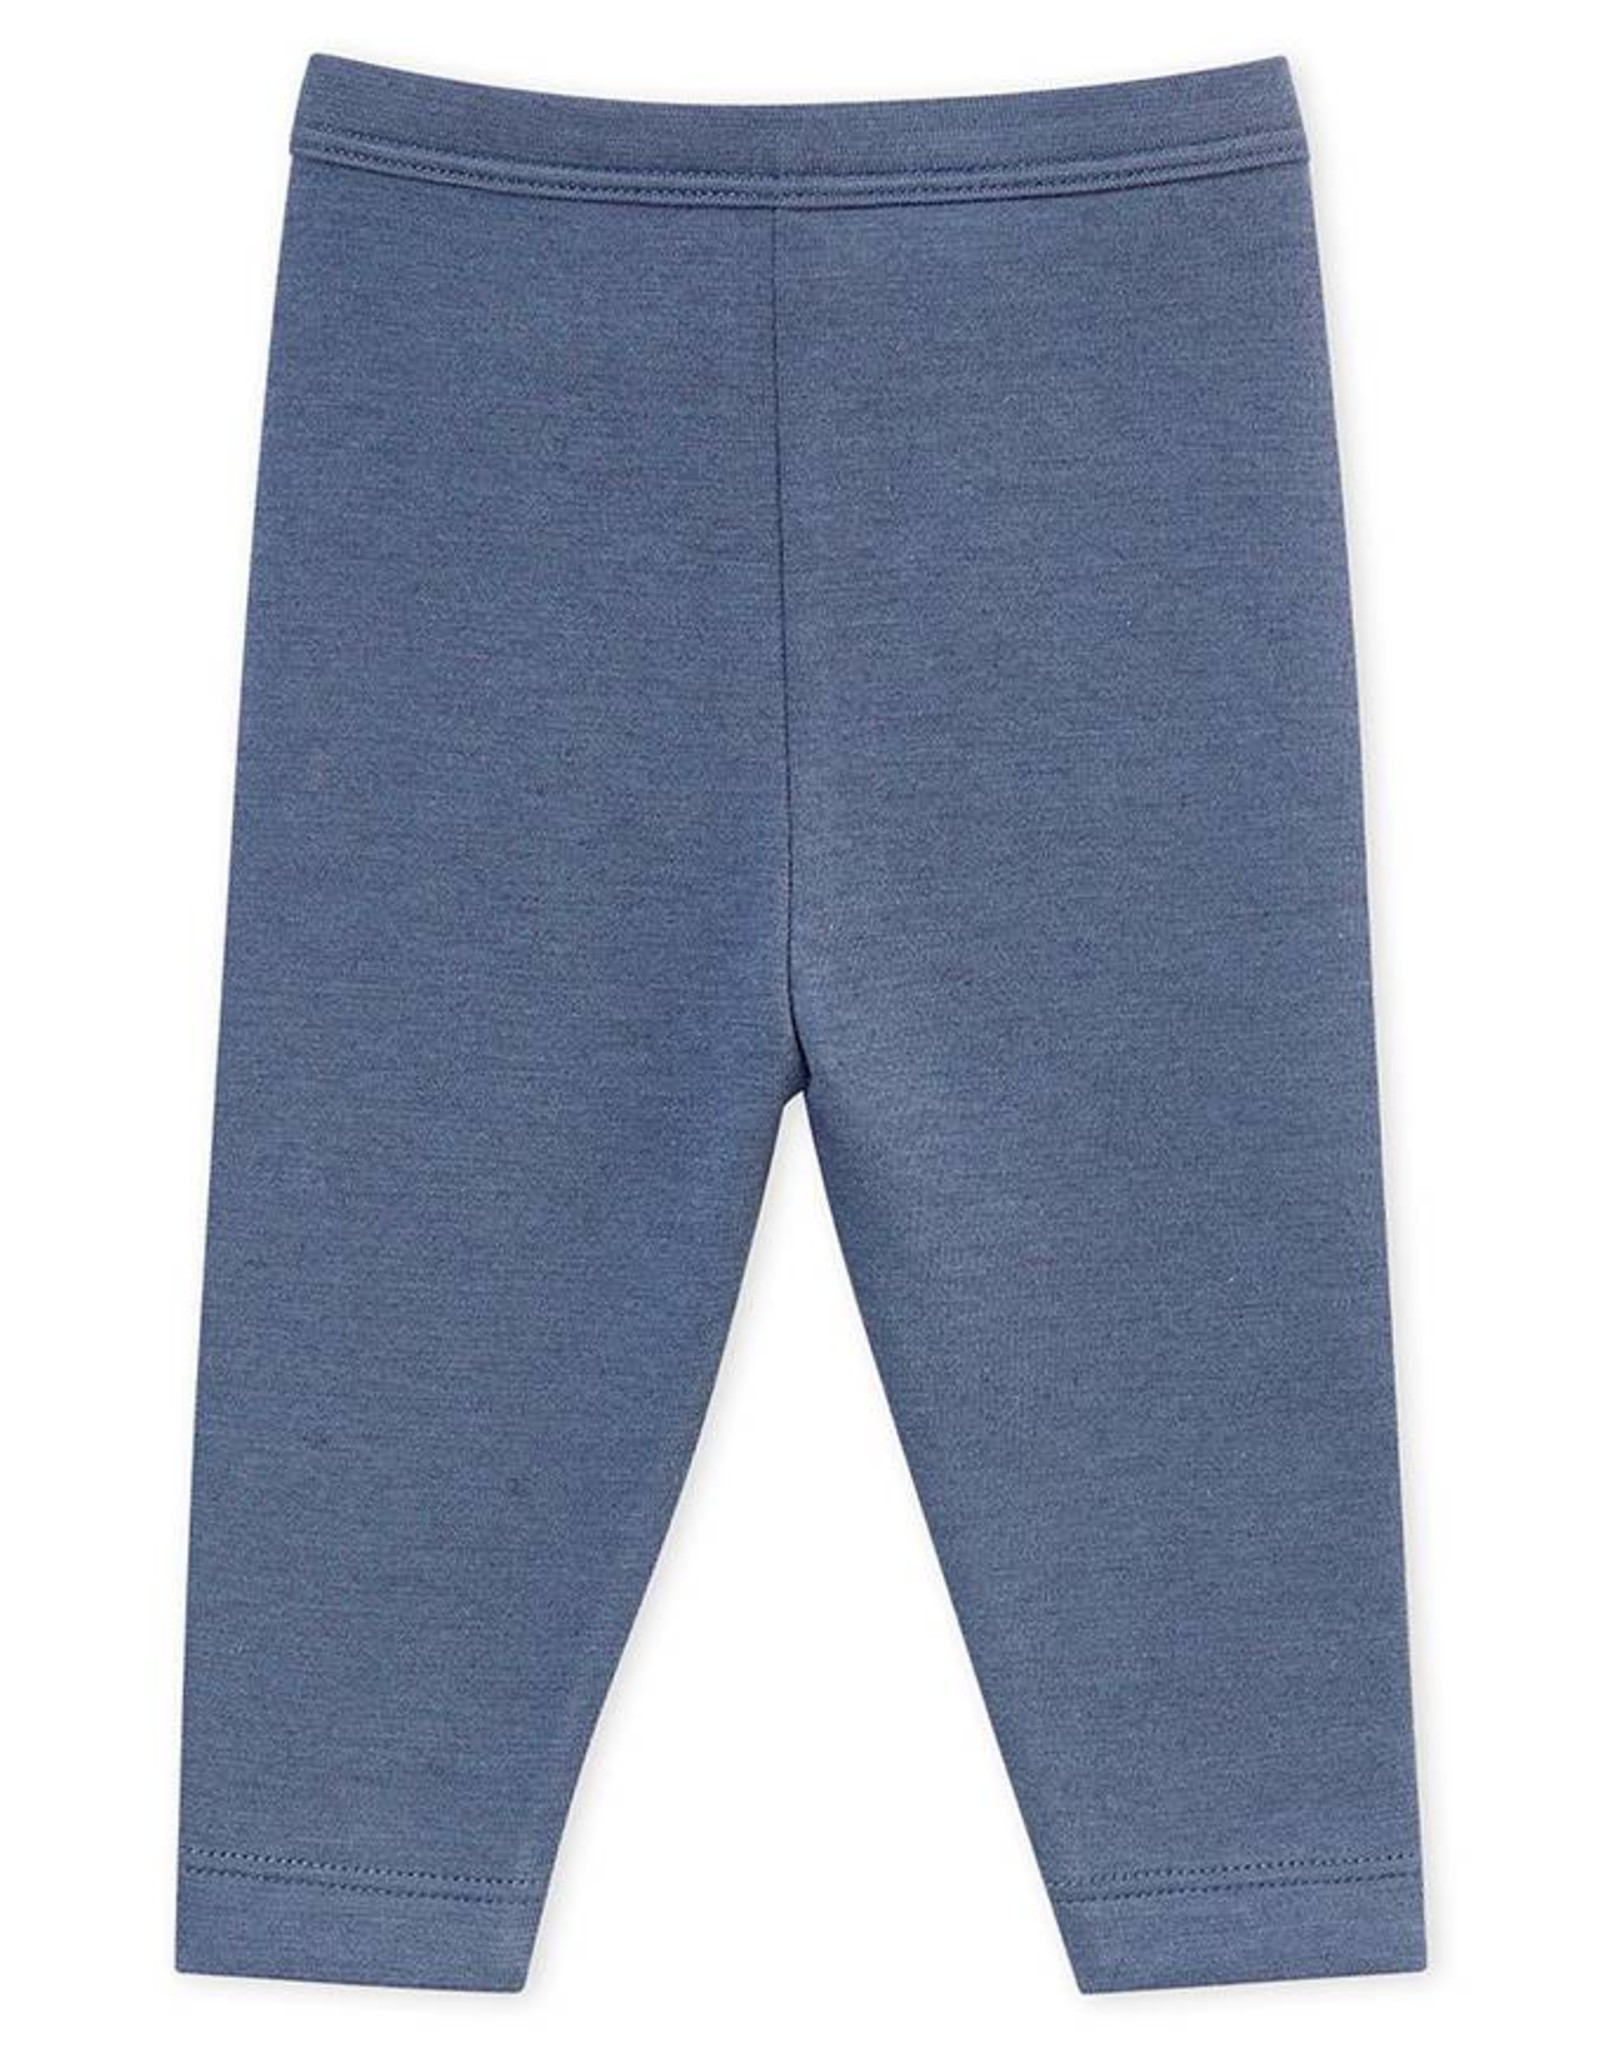 Petit Bateau Wool and cotton leggings